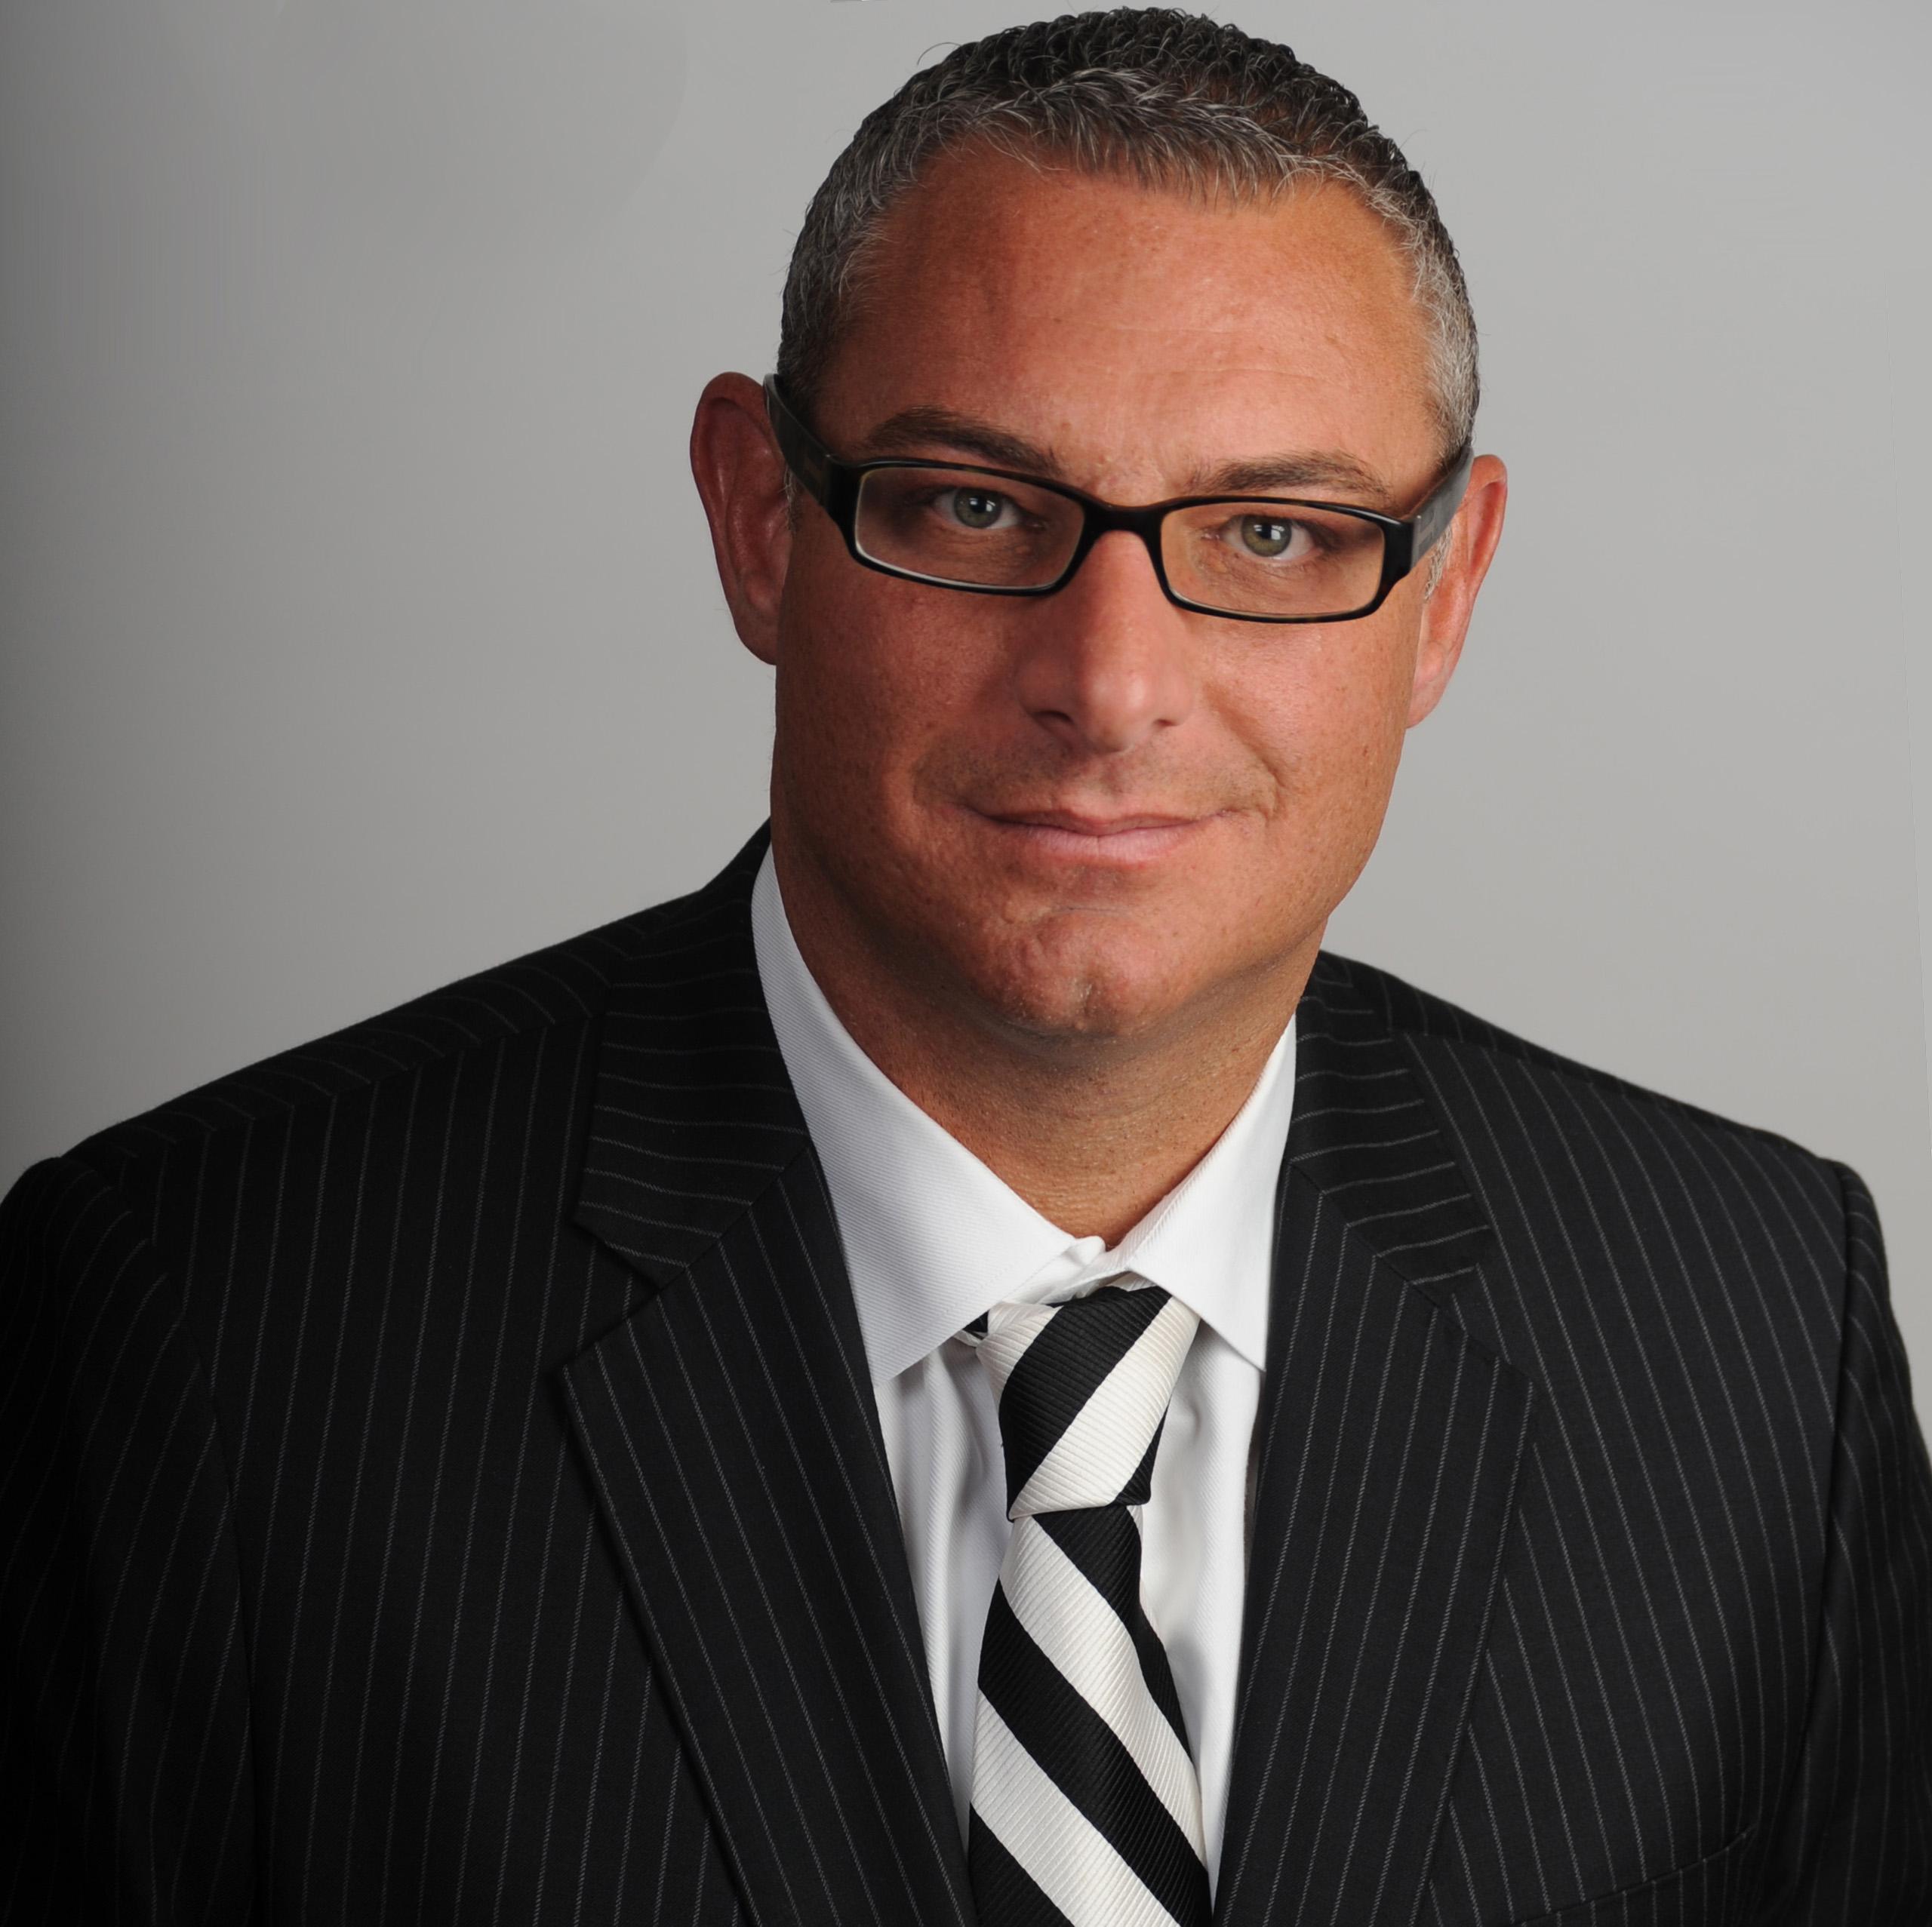 Magazine names 3 suburban attorneys best in Illinois